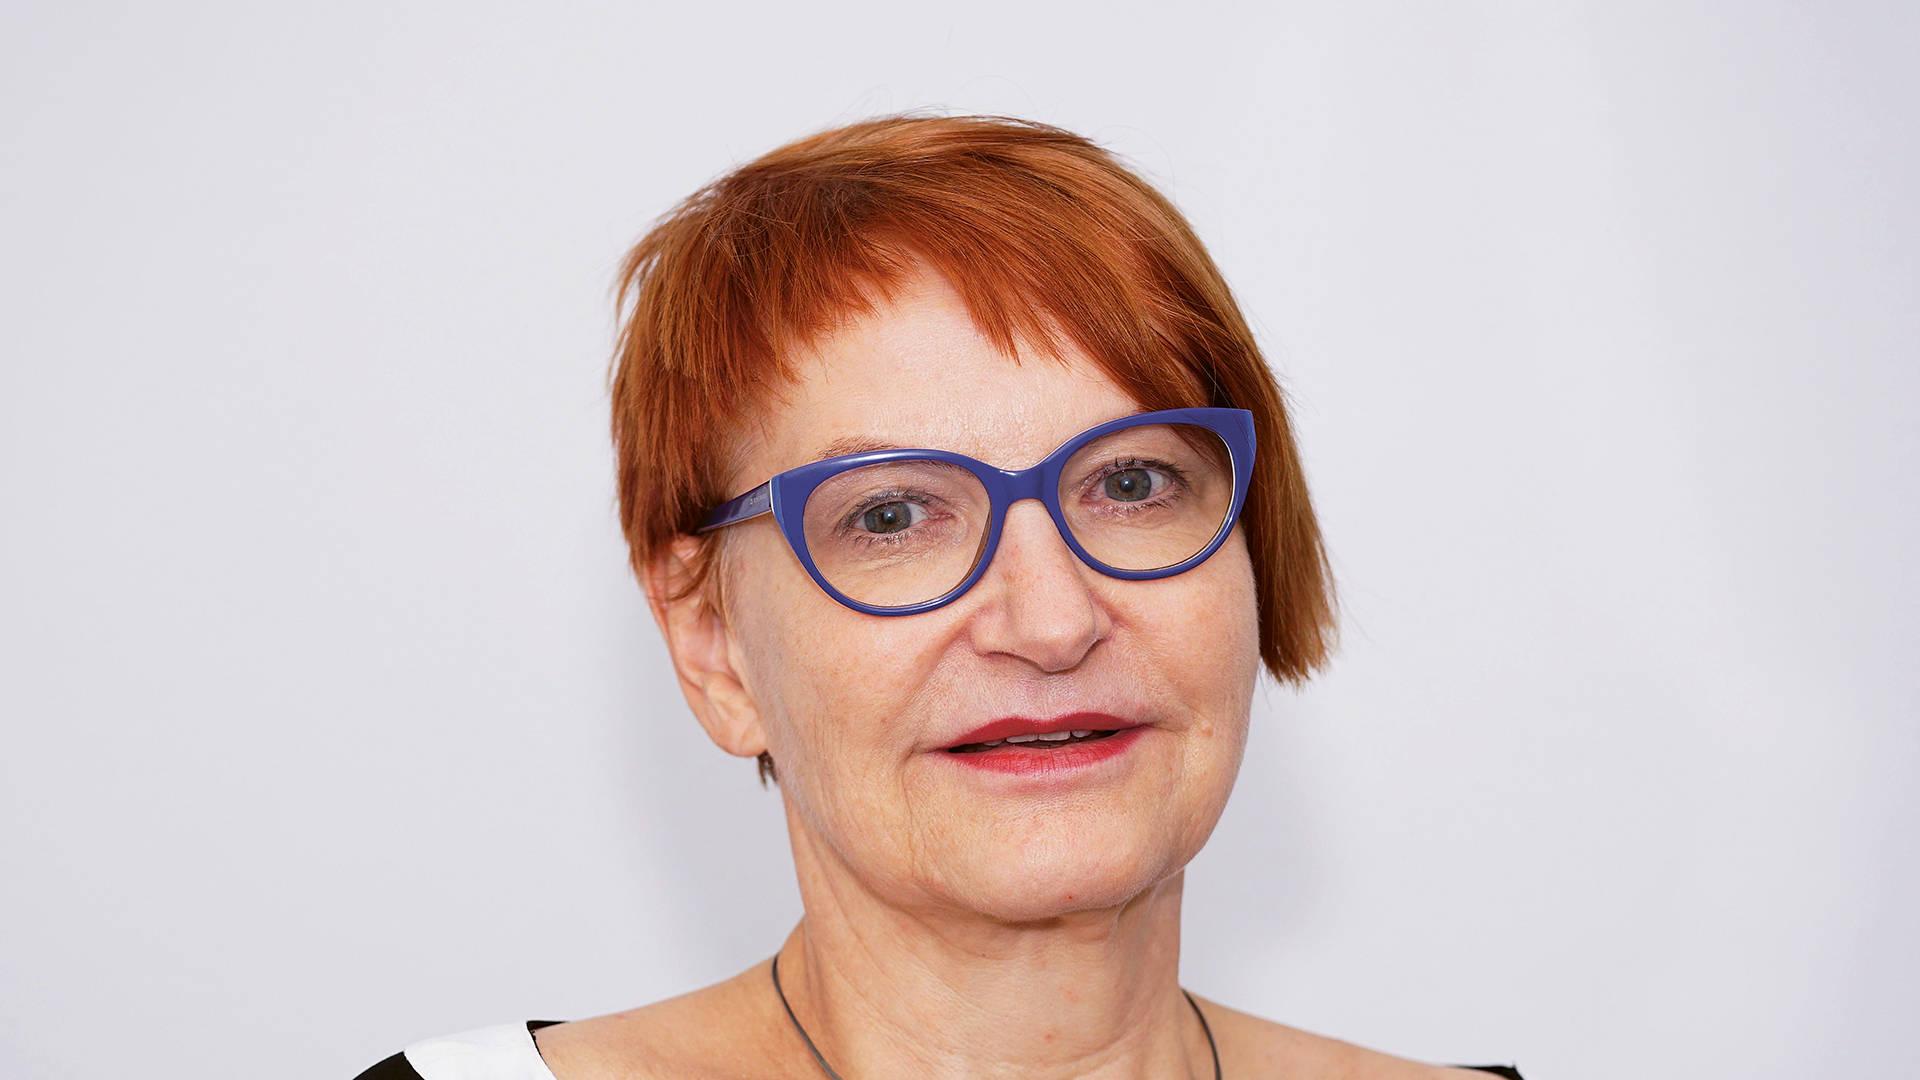 Dr Martina Schulze, Director of the DWIH São Paulo